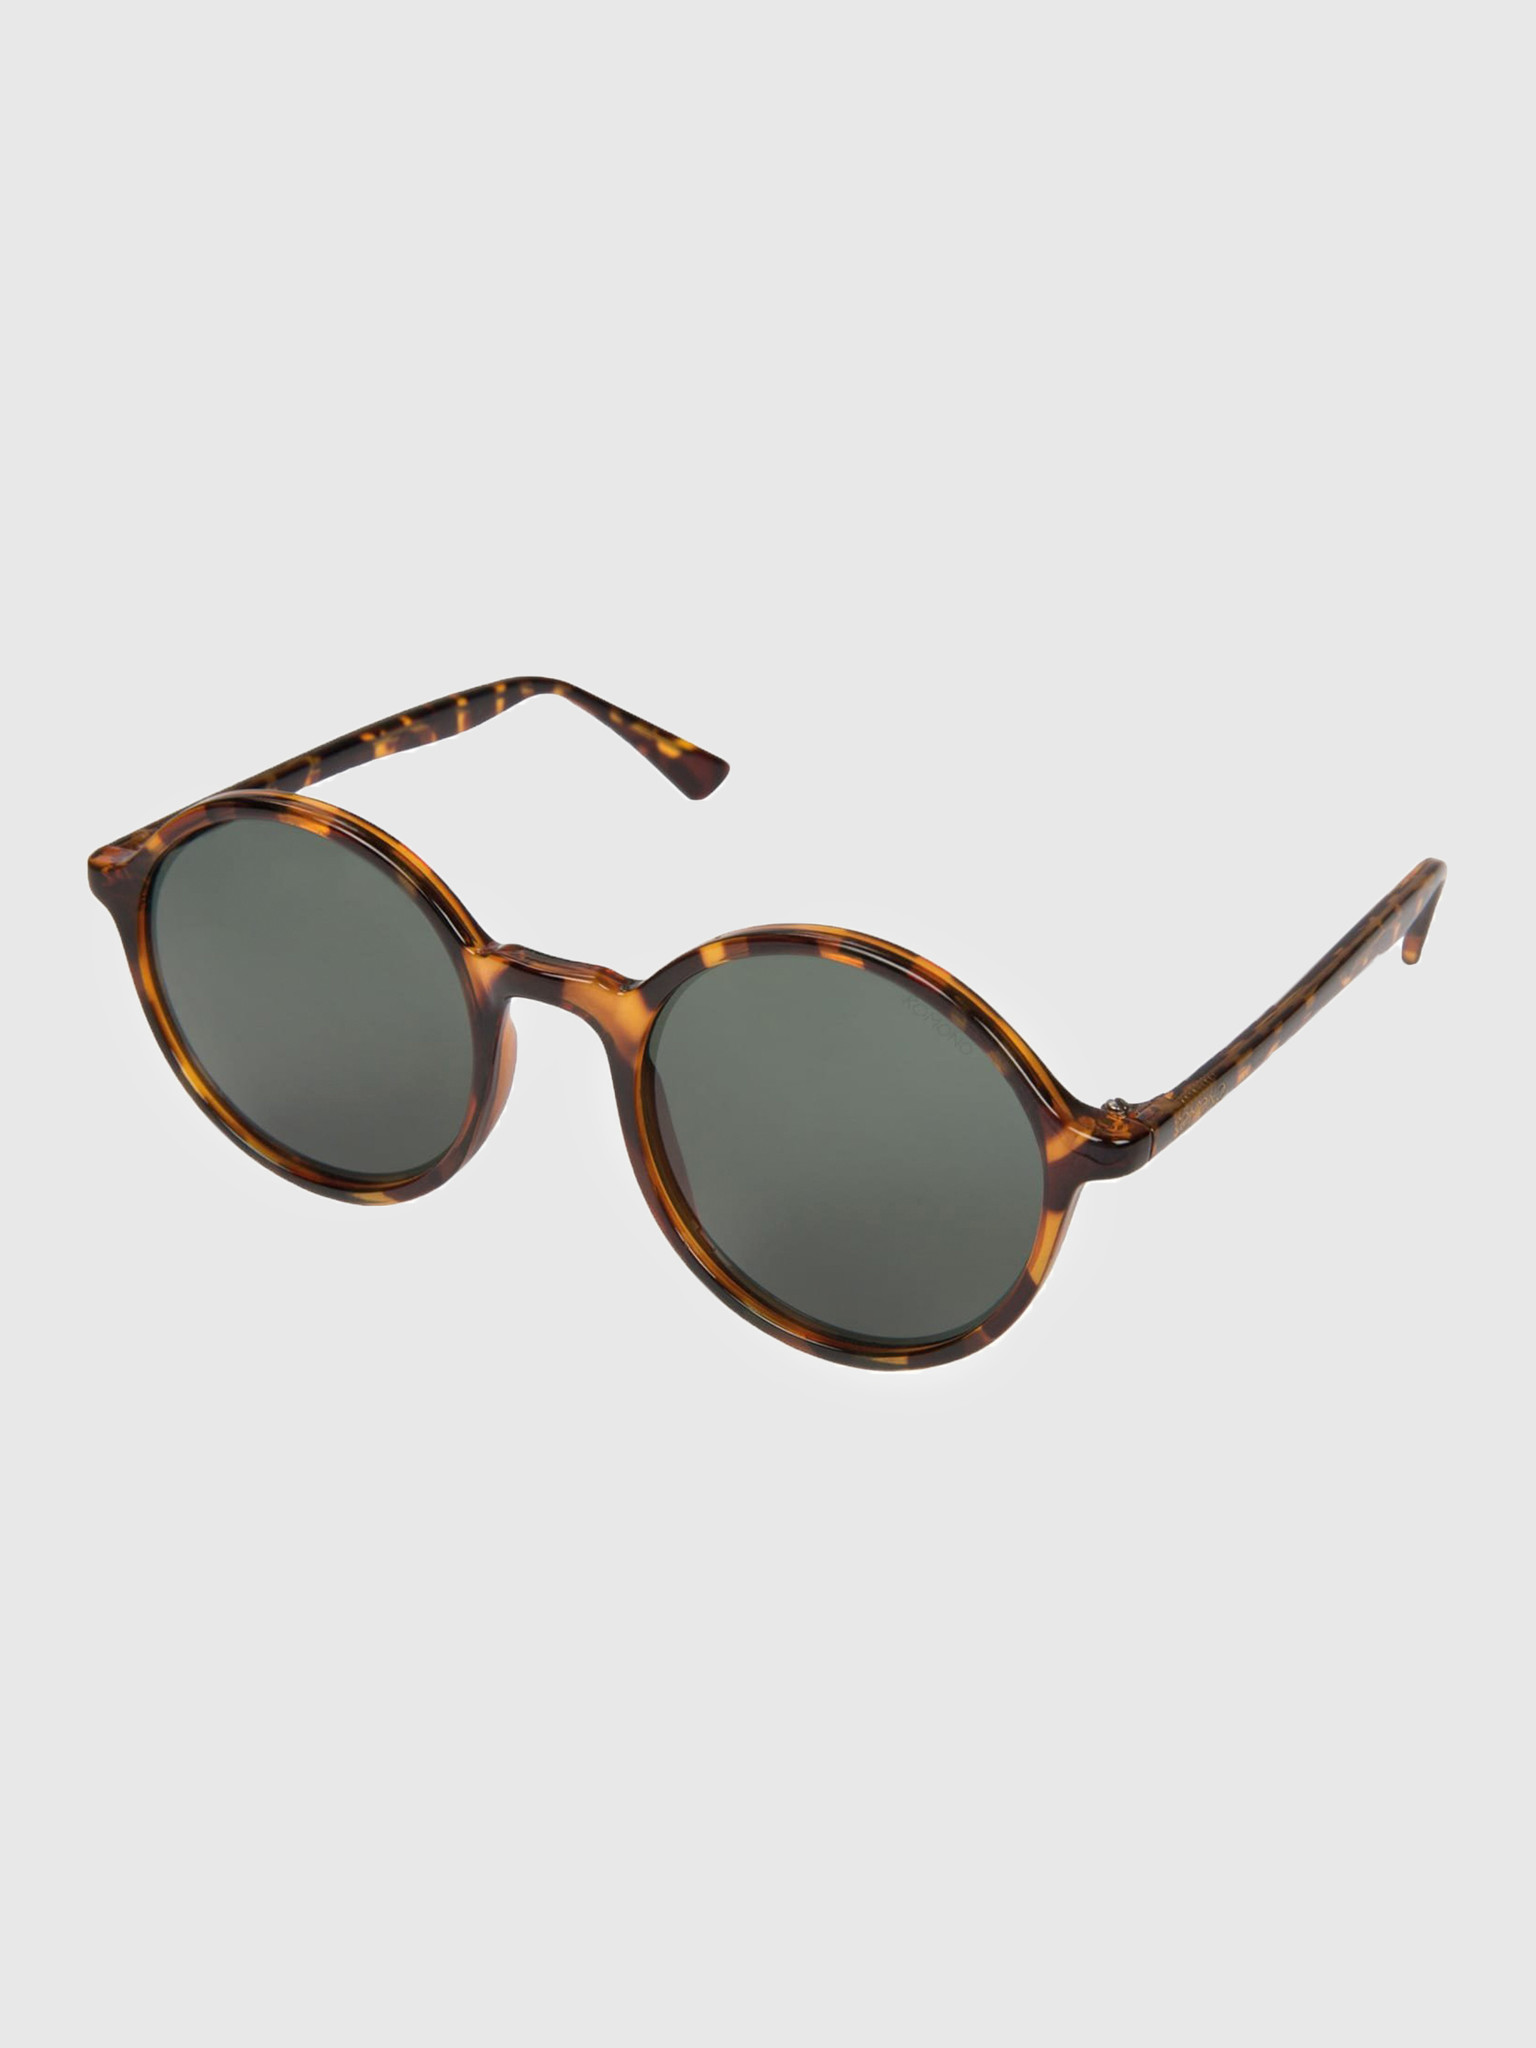 Komono Komono Madison Sunglasses Tortoise Kom-S3250